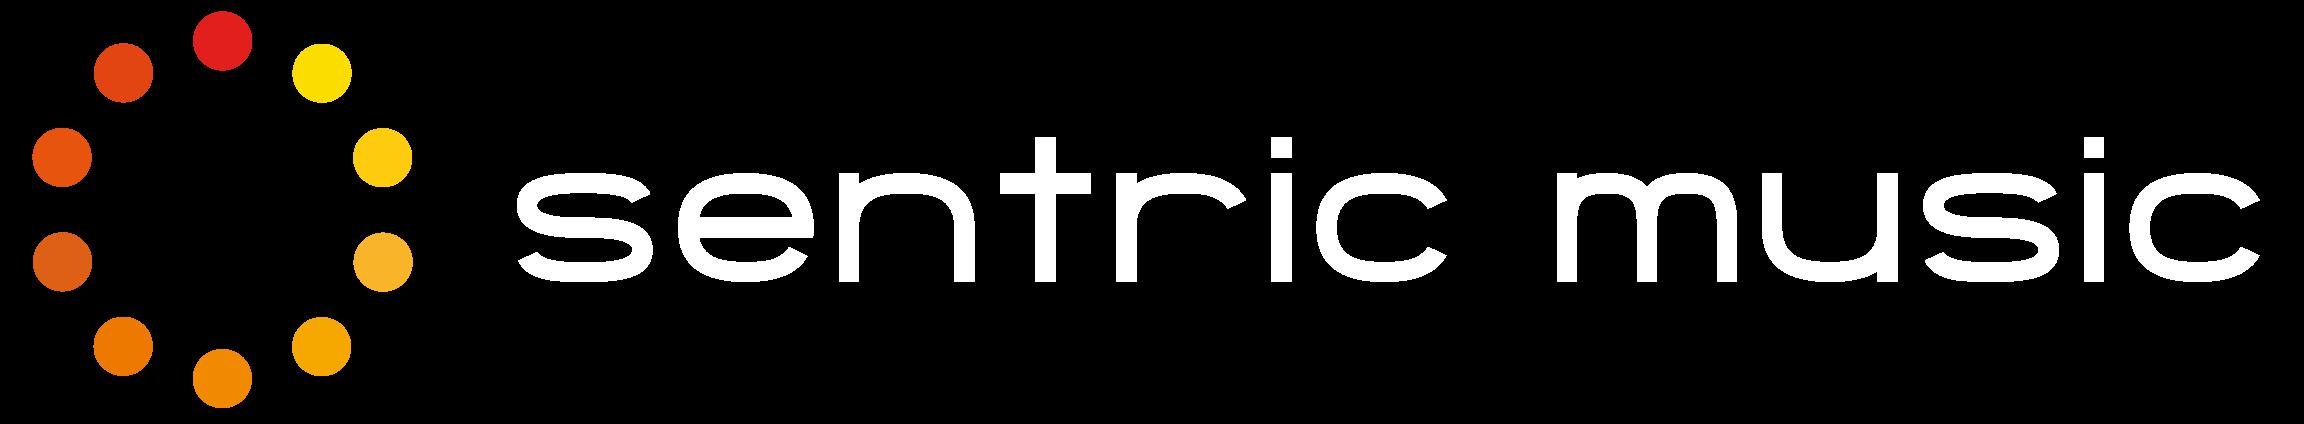 Sentric